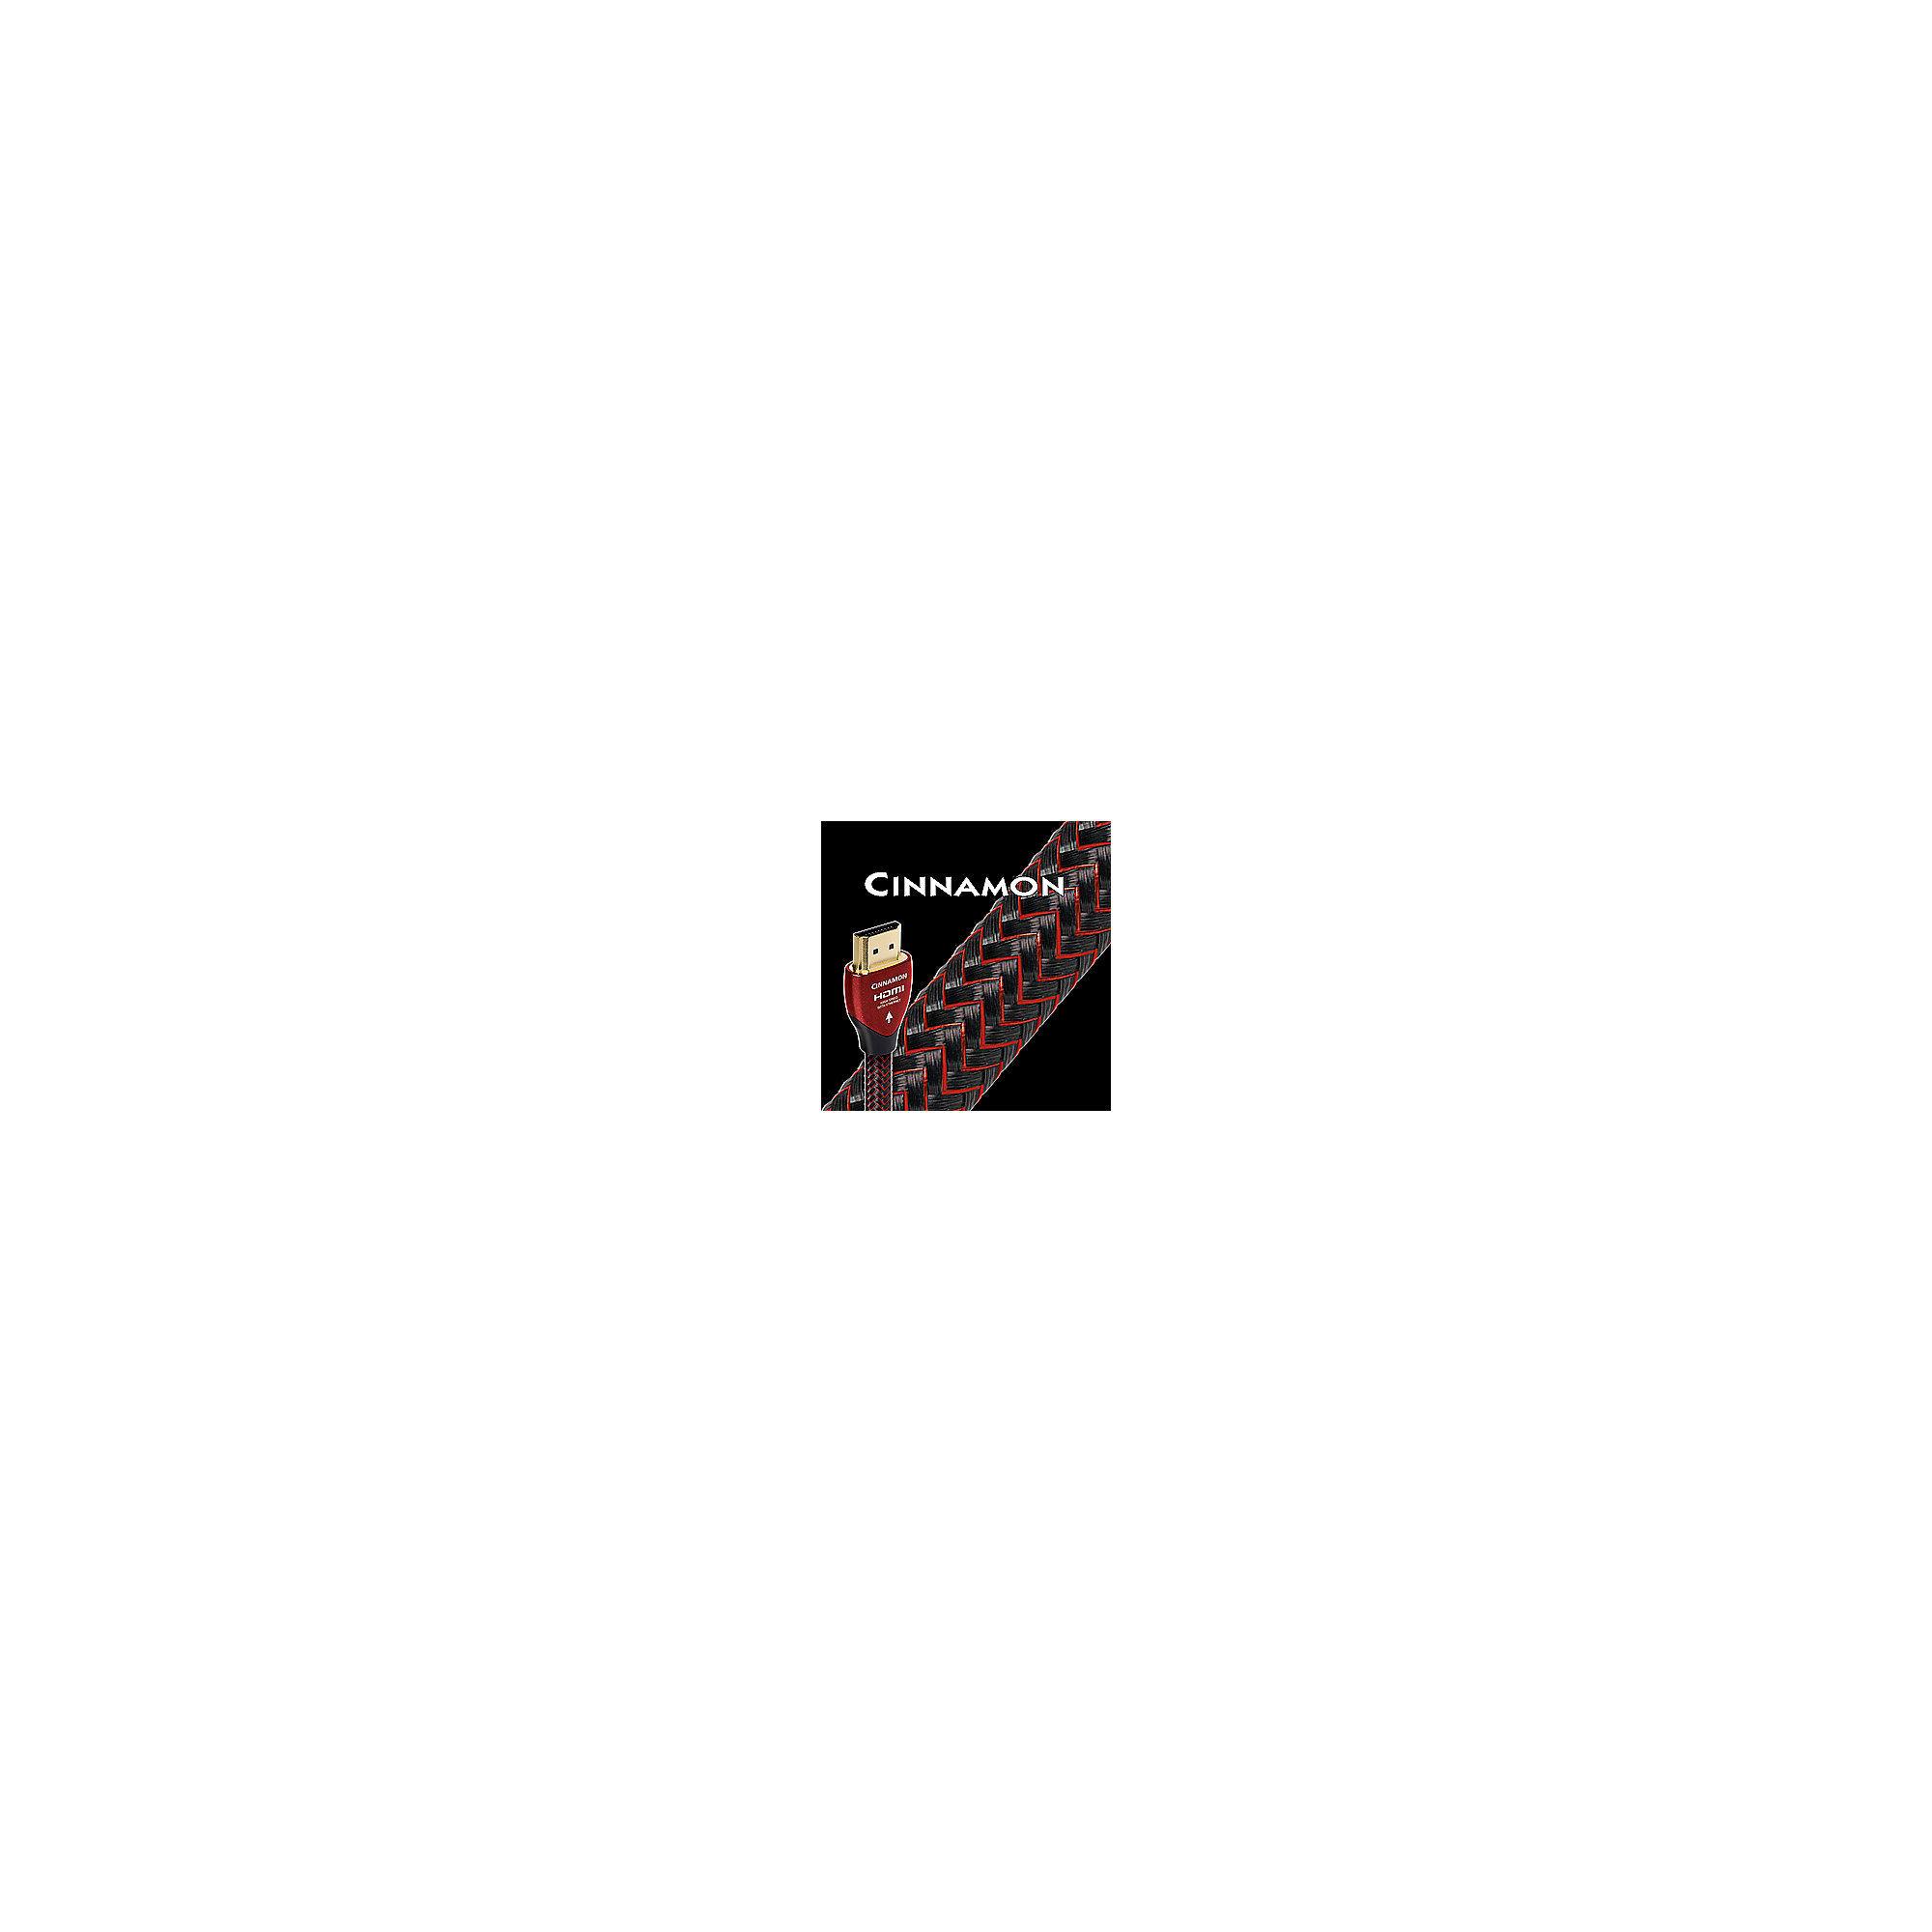 Audioquest CINNAMON HDMI Kabel 1,5m Digital A/V rot ++ Cyberport